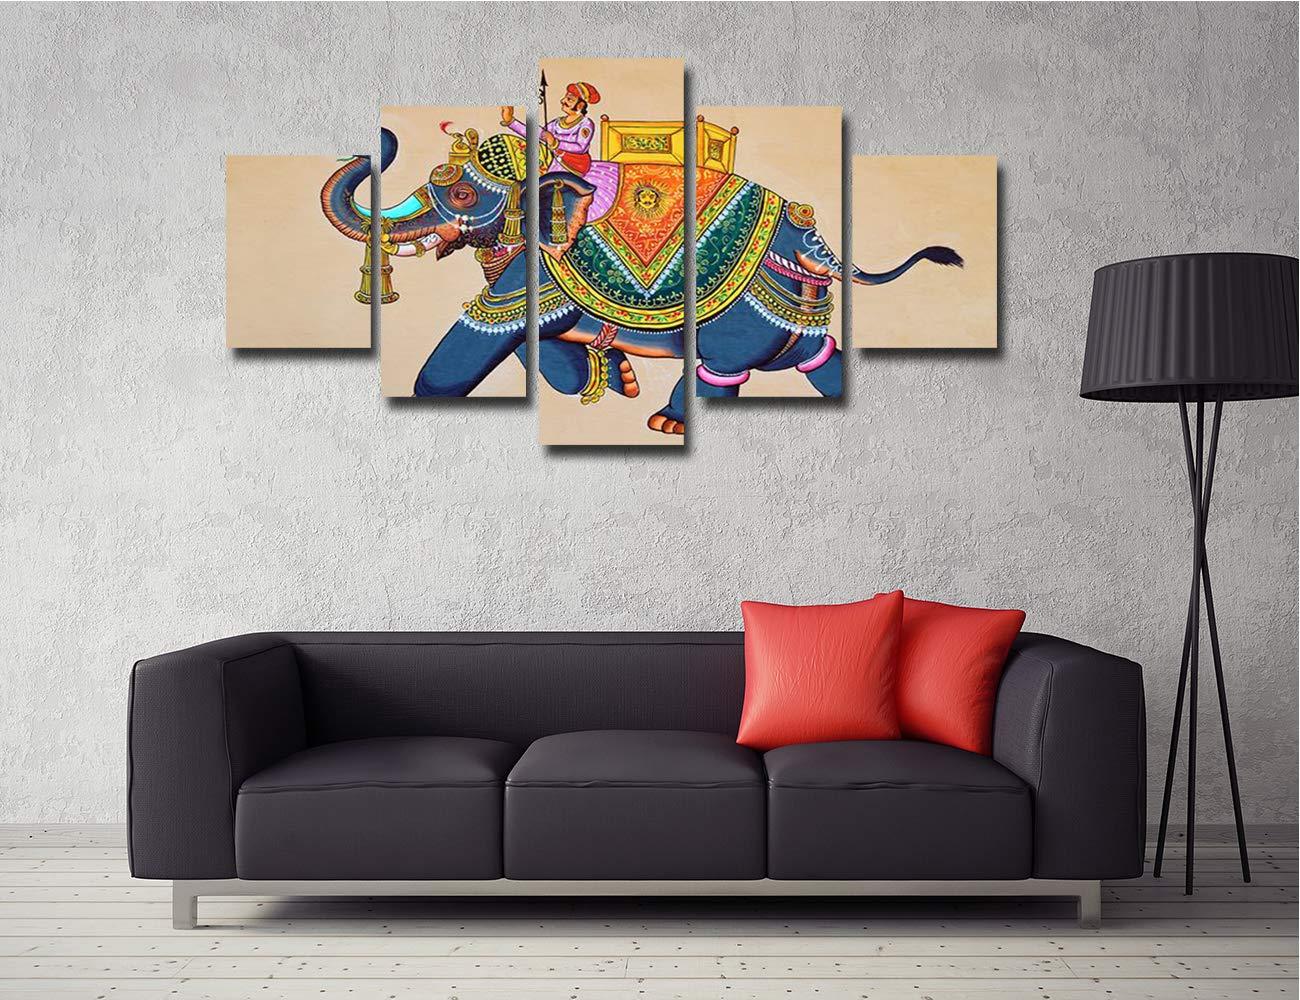 Amazon.com: Lienzo decorativo para pared, diseño de elefante ...